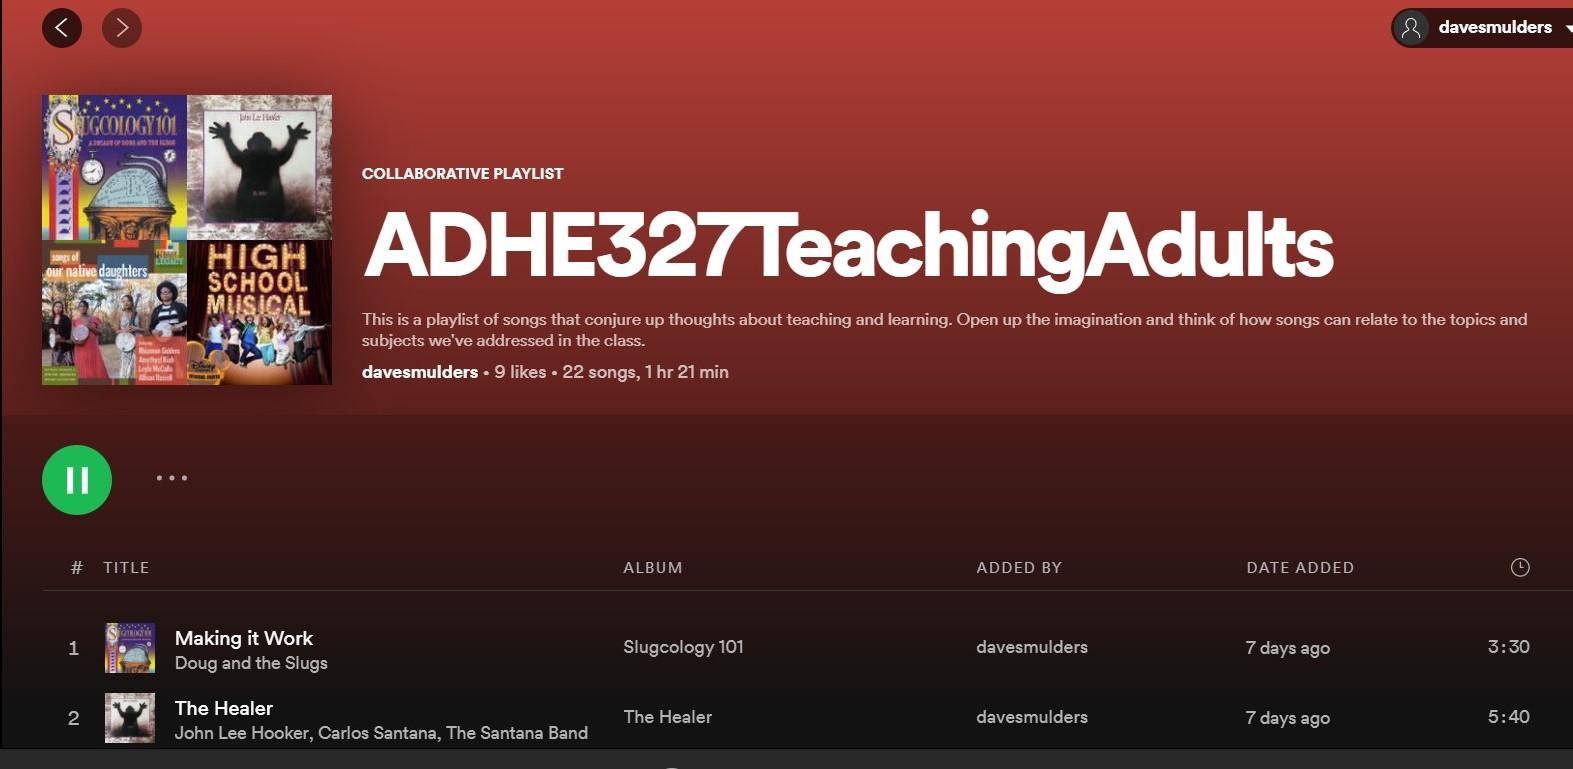 screenshot of my class's Spotify Playlist at https://open.spotify.com/playlist/4fvnLUFuMuJkQis60JOlYk